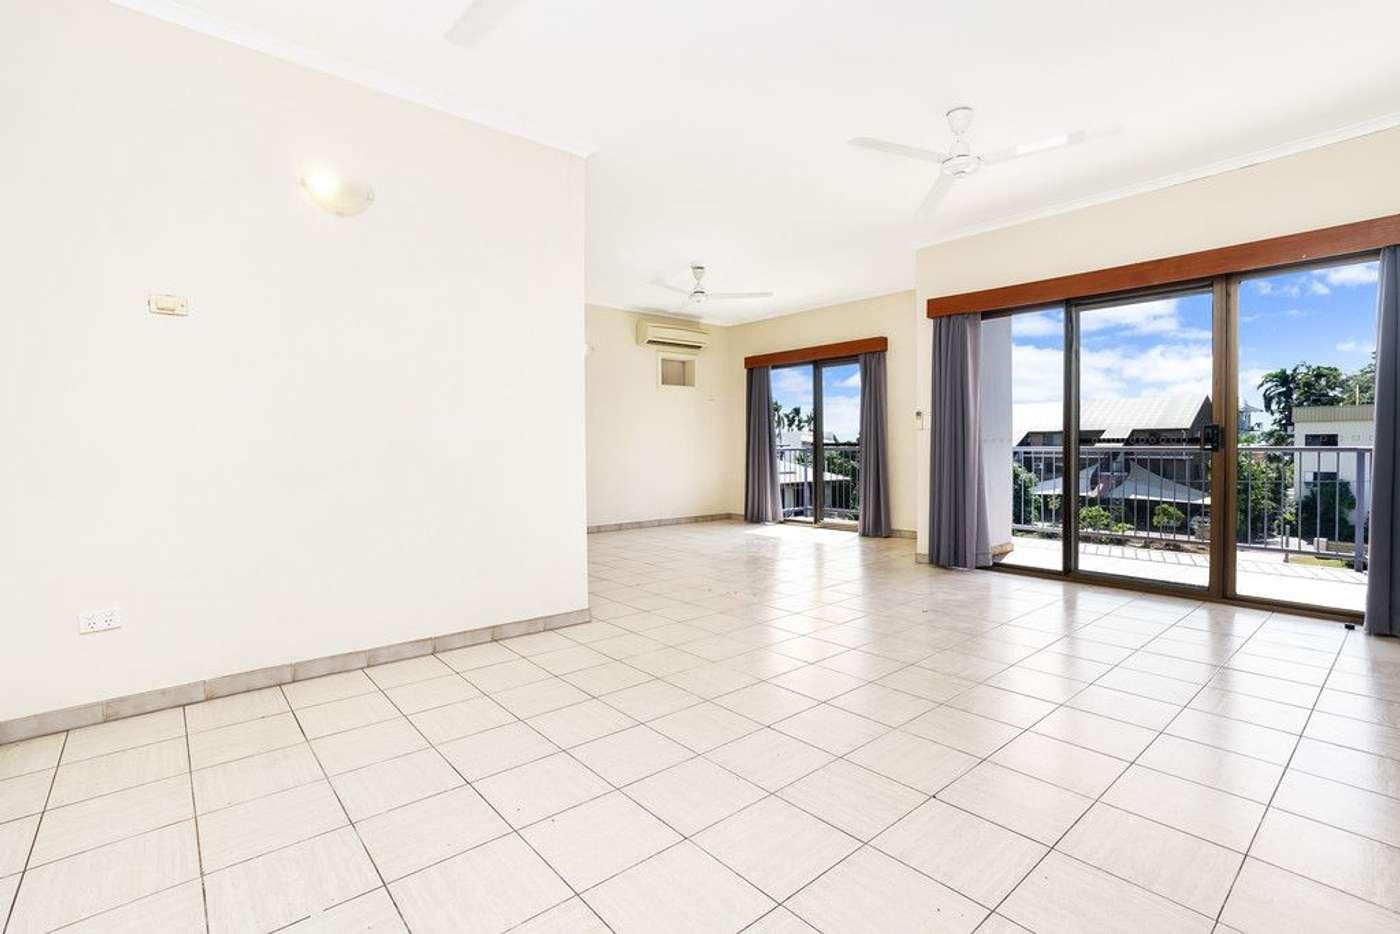 Main view of Homely unit listing, 9/15 Houston Street, Larrakeyah NT 820